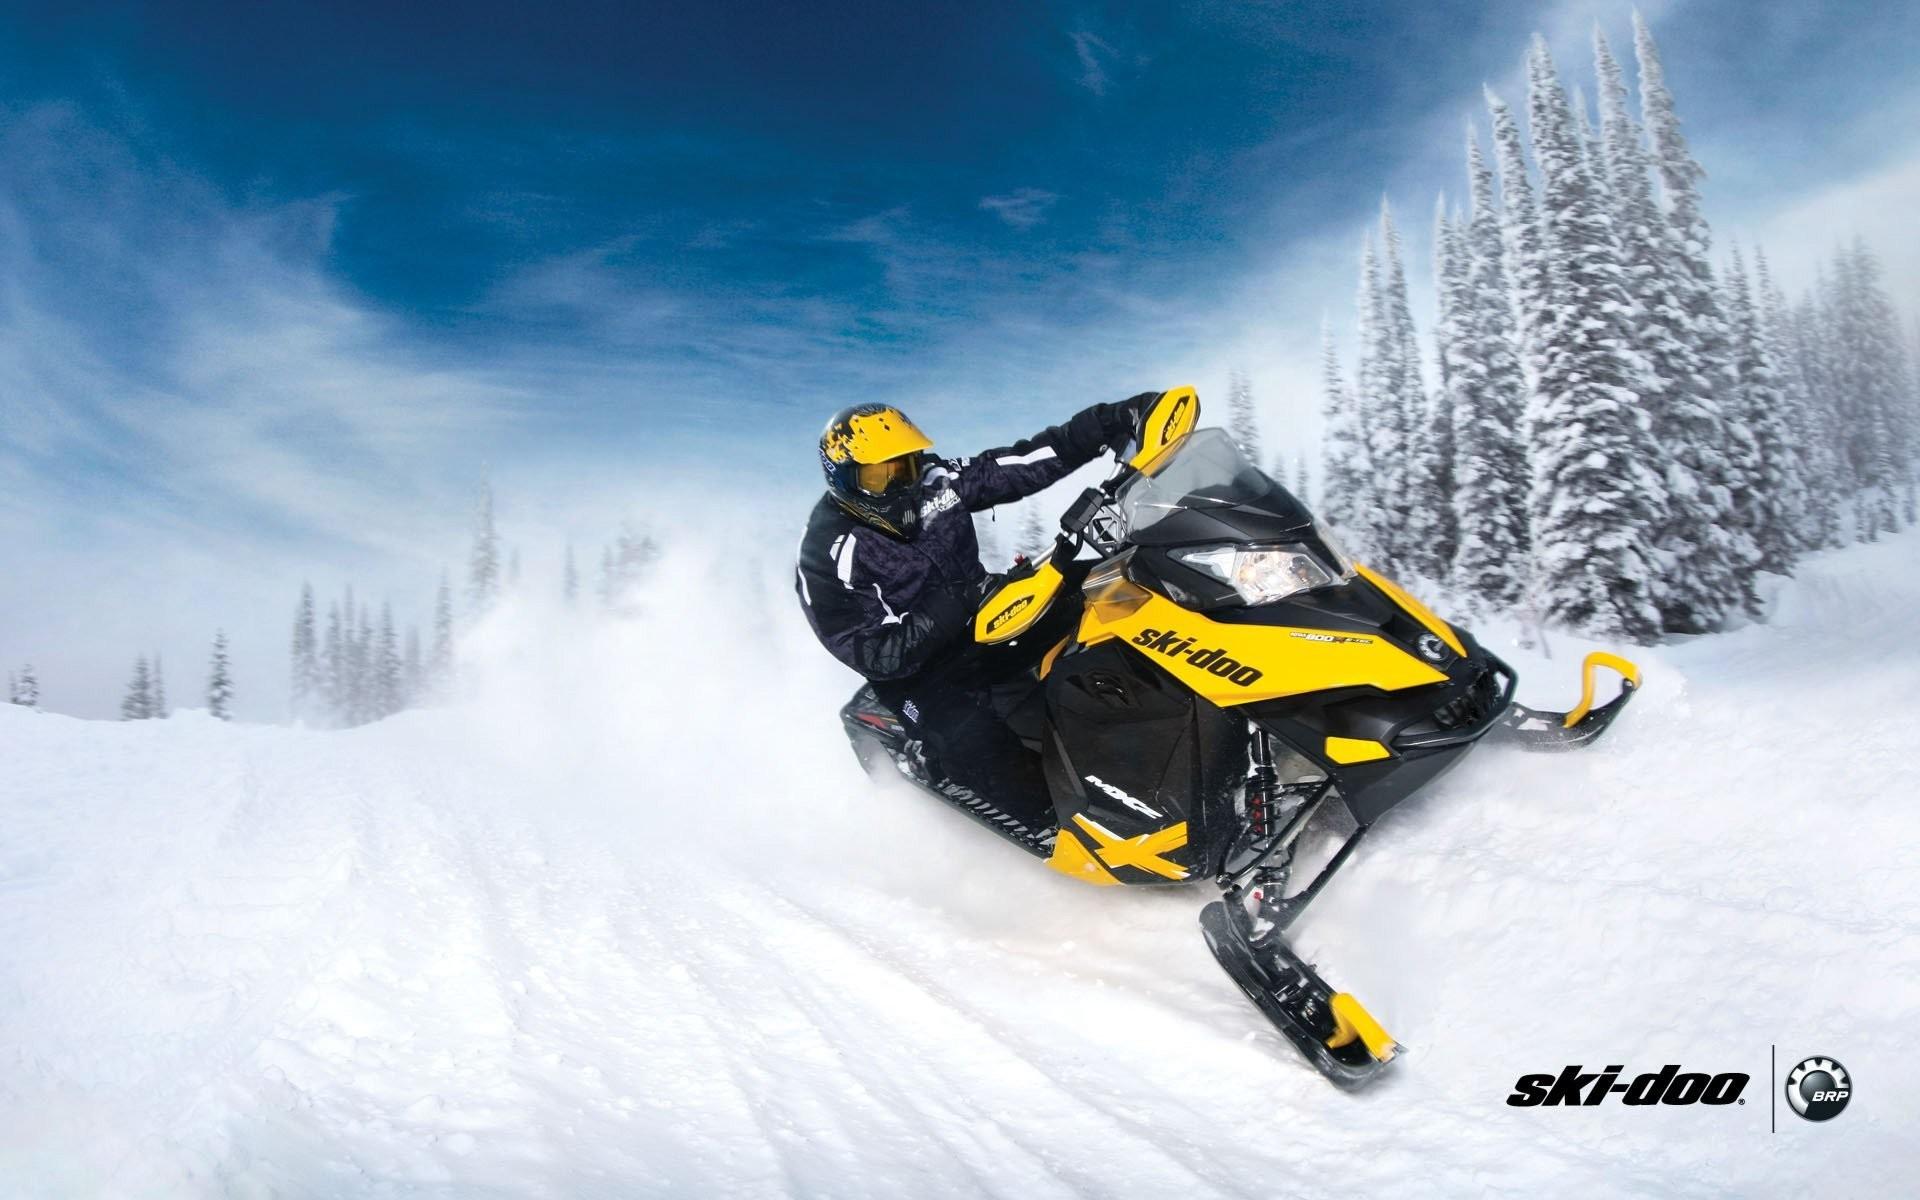 ski-doo skidoo mxz snowmobile snowmobiles brp snow snow forest sports sport